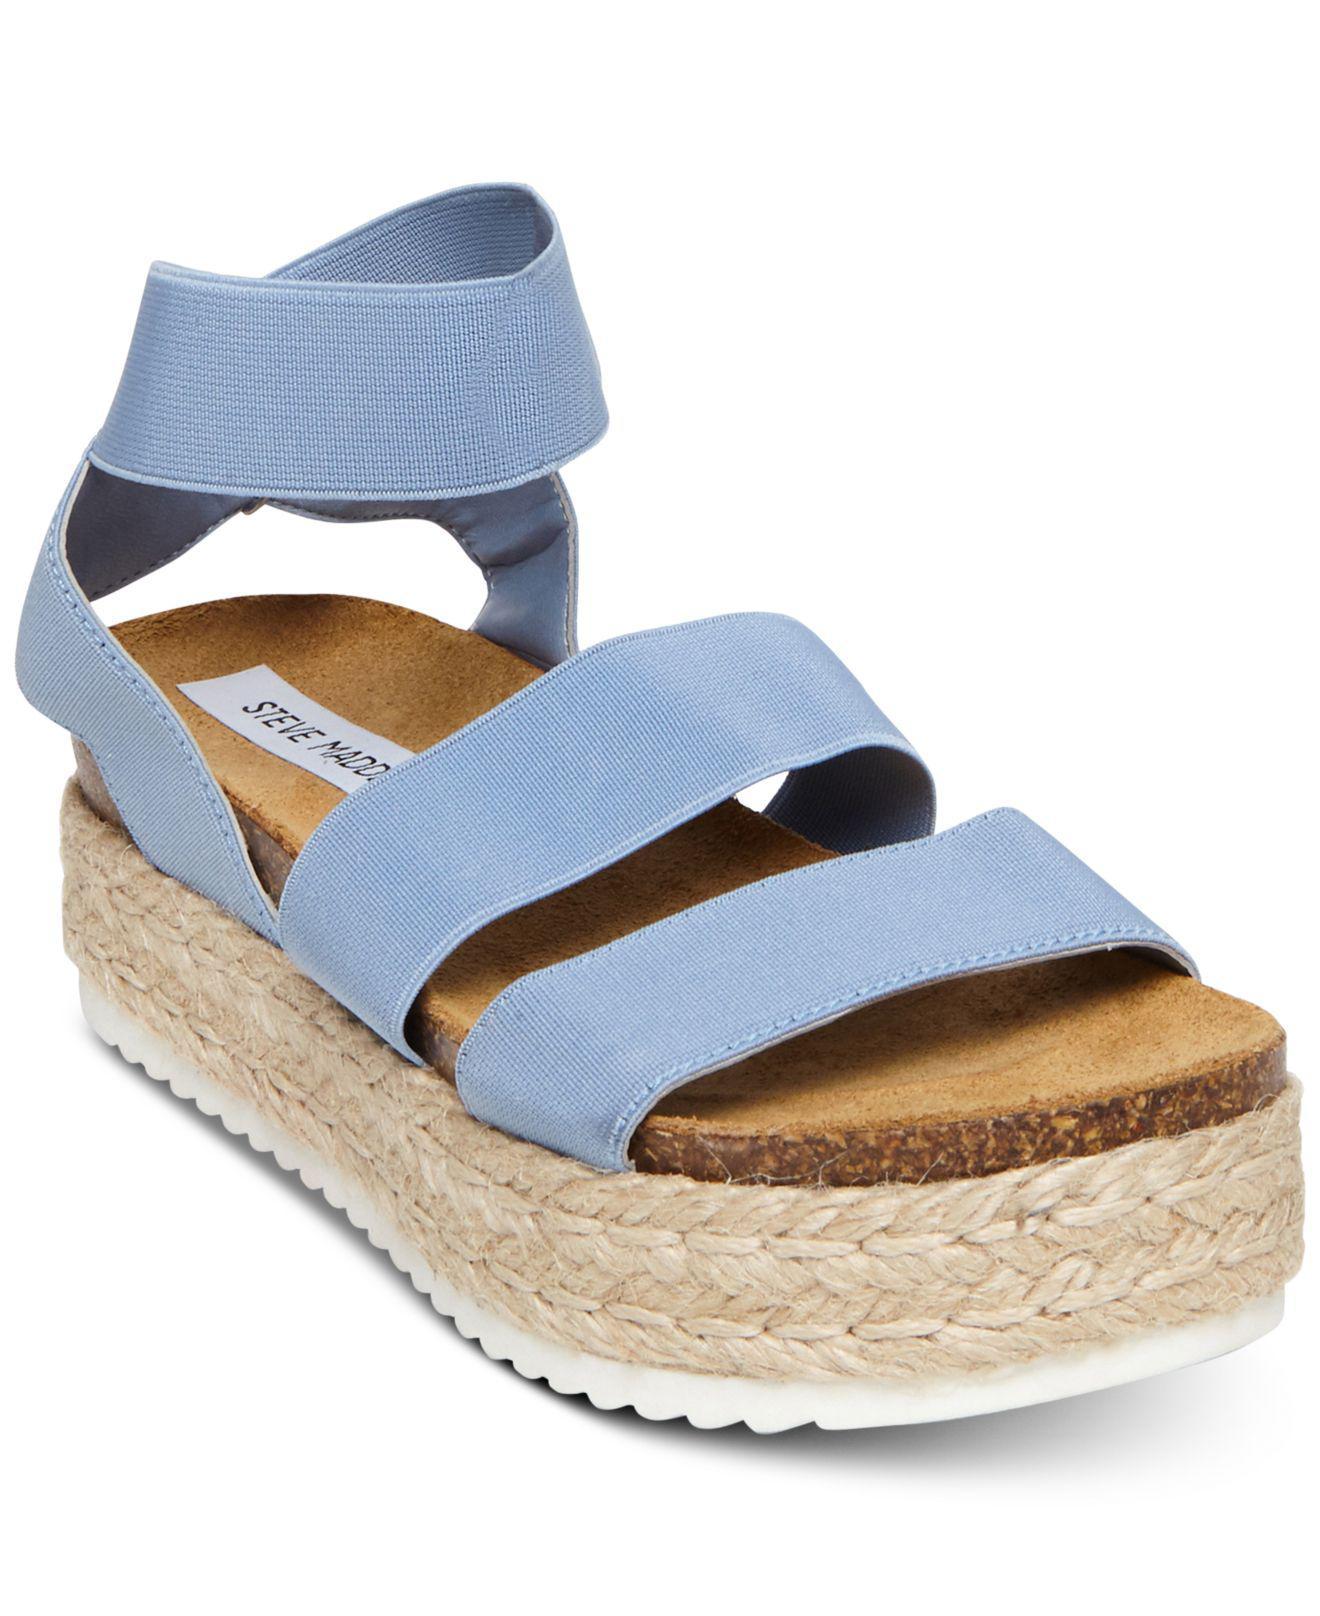 66645dd39b5b84 Lyst - Steve Madden Kimmie Espadrille Sandal (black) Women s Shoes ...